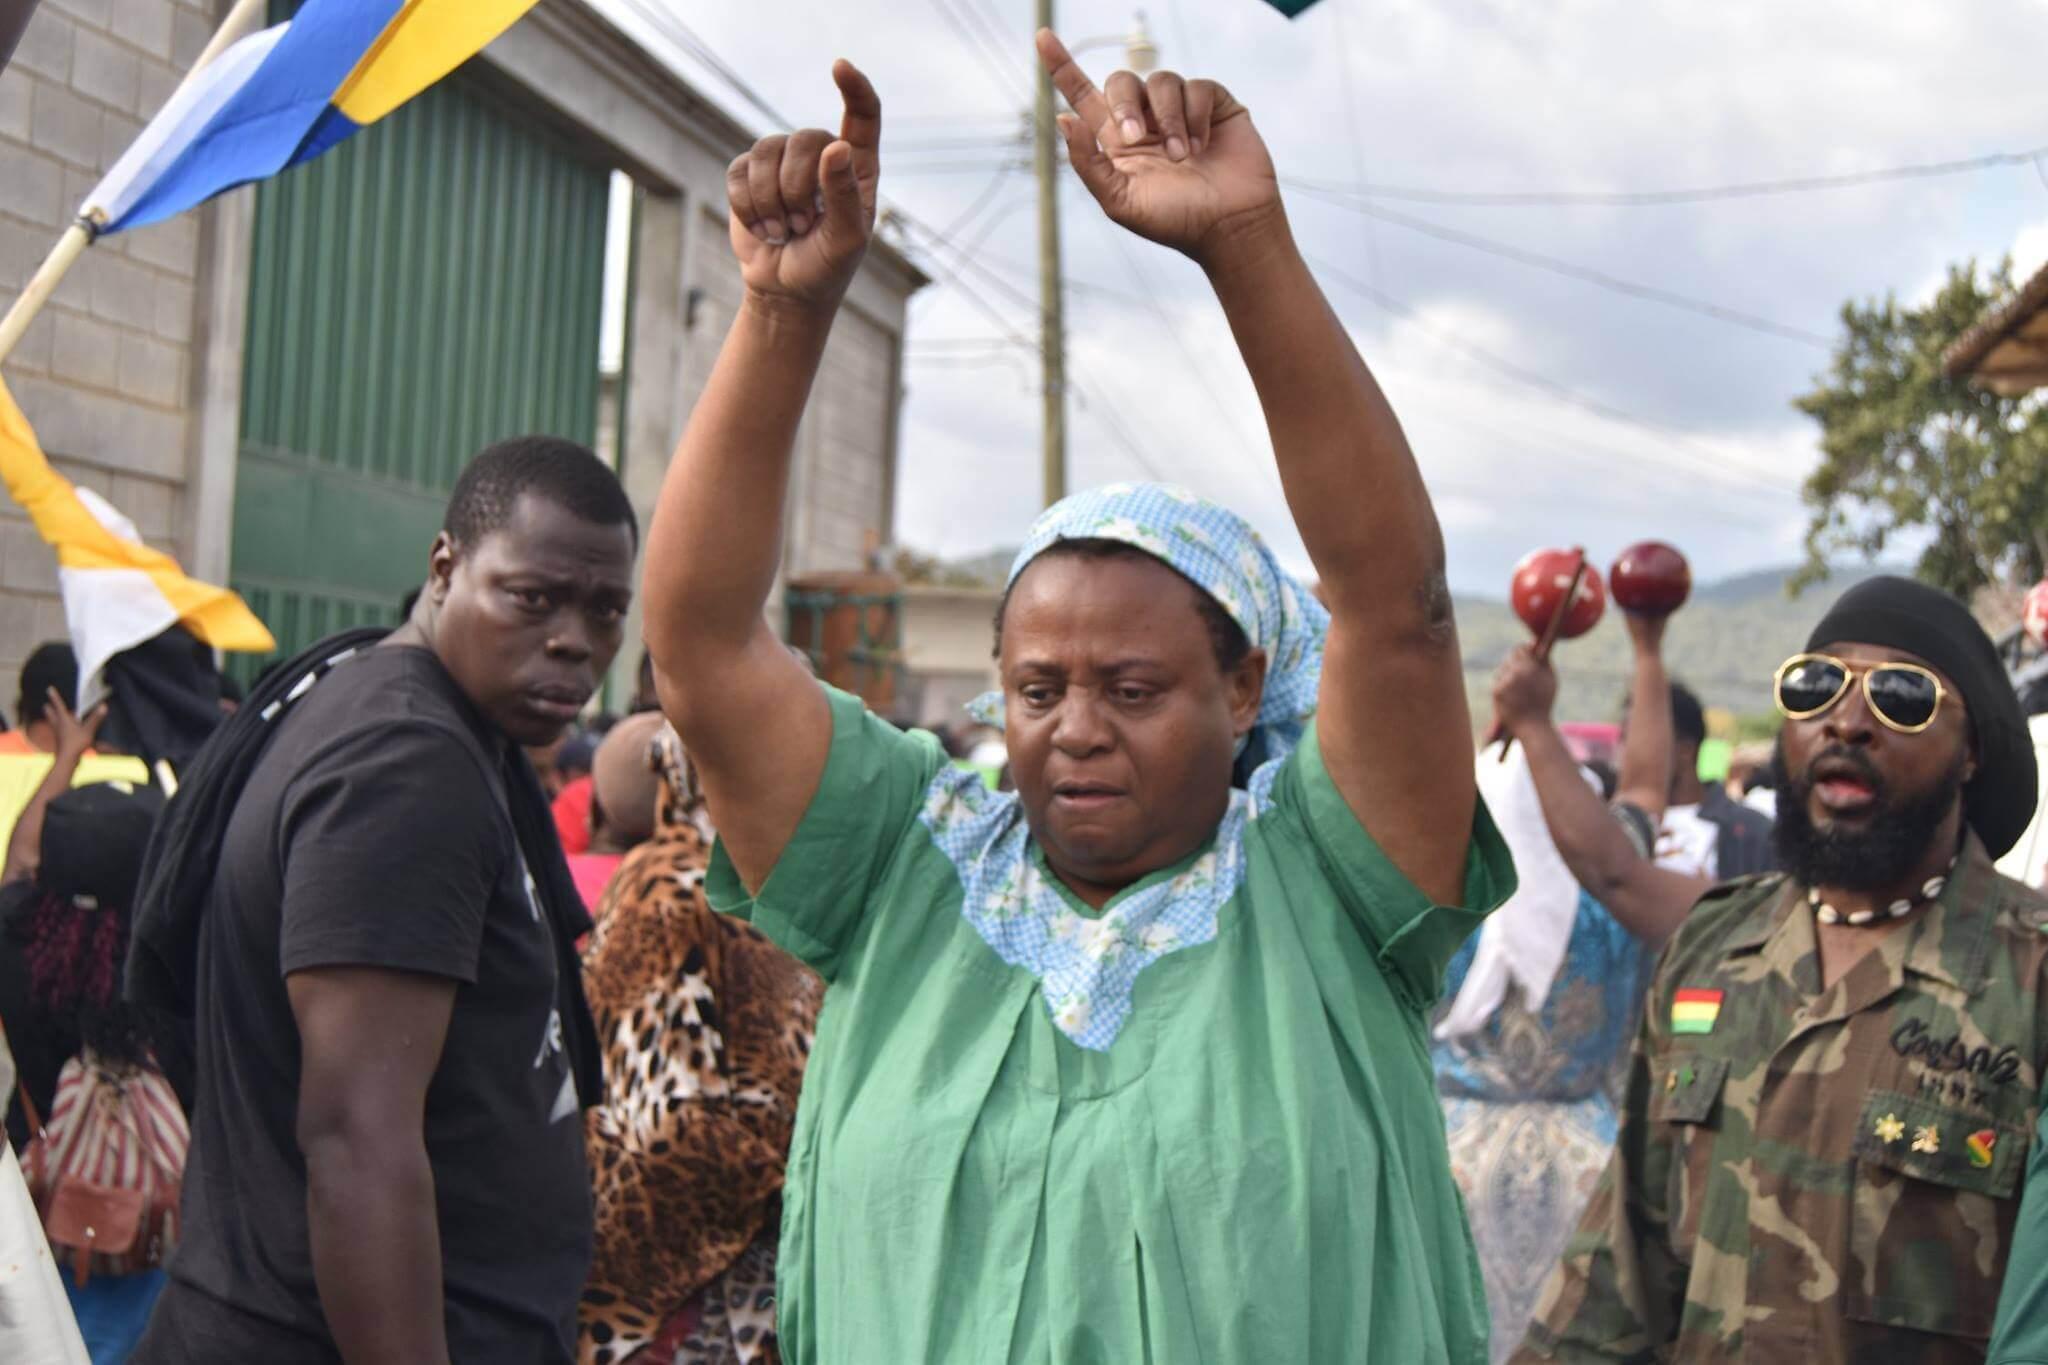 Berta solidaridad 2 Esperanza Honduras